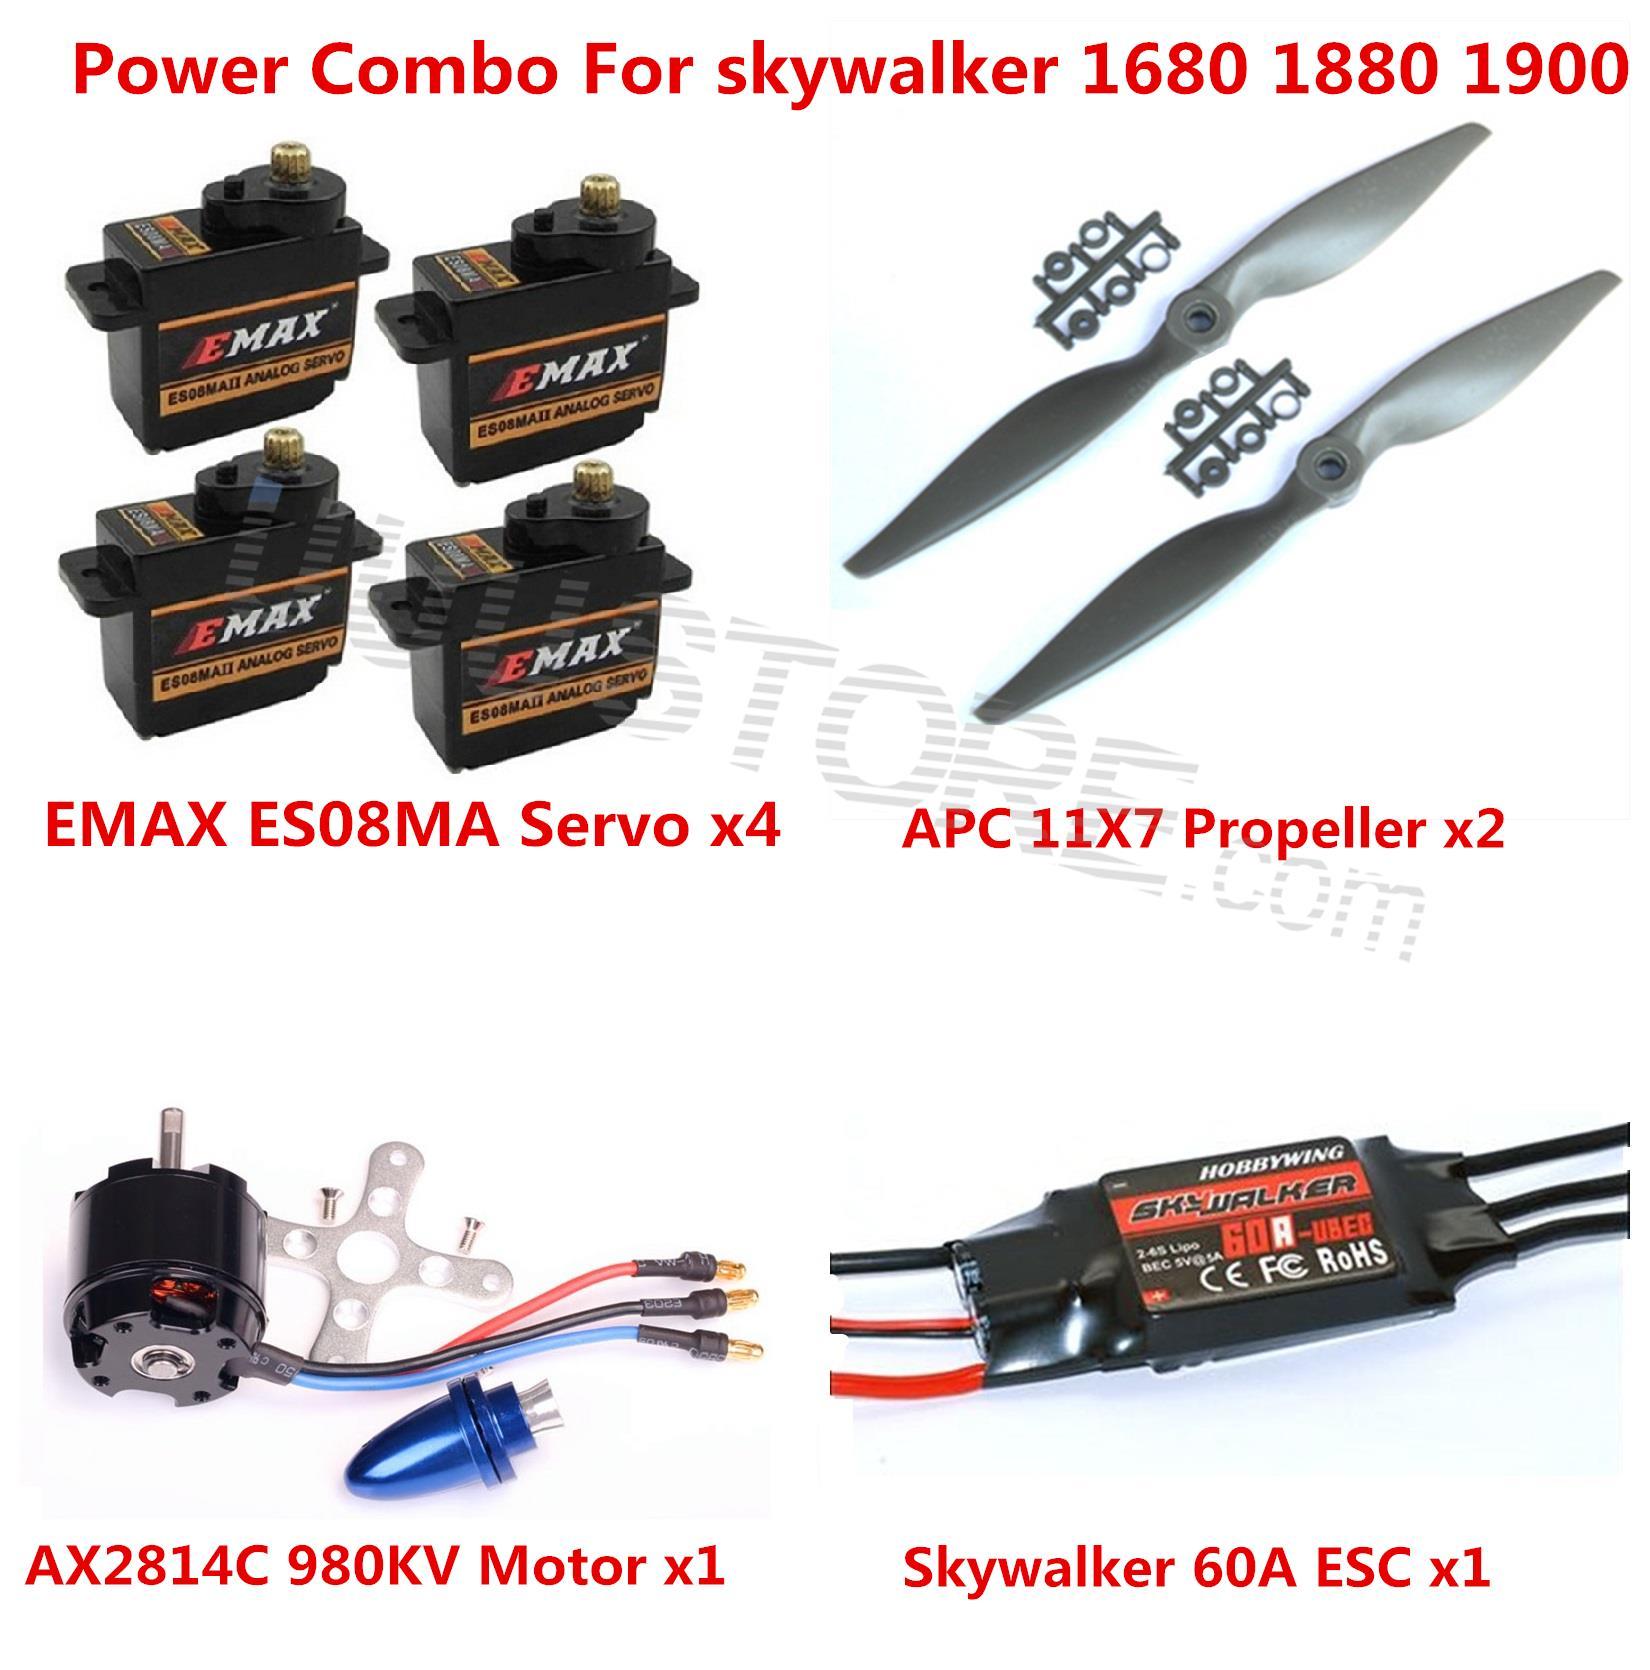 Power Combo Kit For Skywalker 1680 1880 1900 EPO RC Airplane Motor ESC Props and Servos